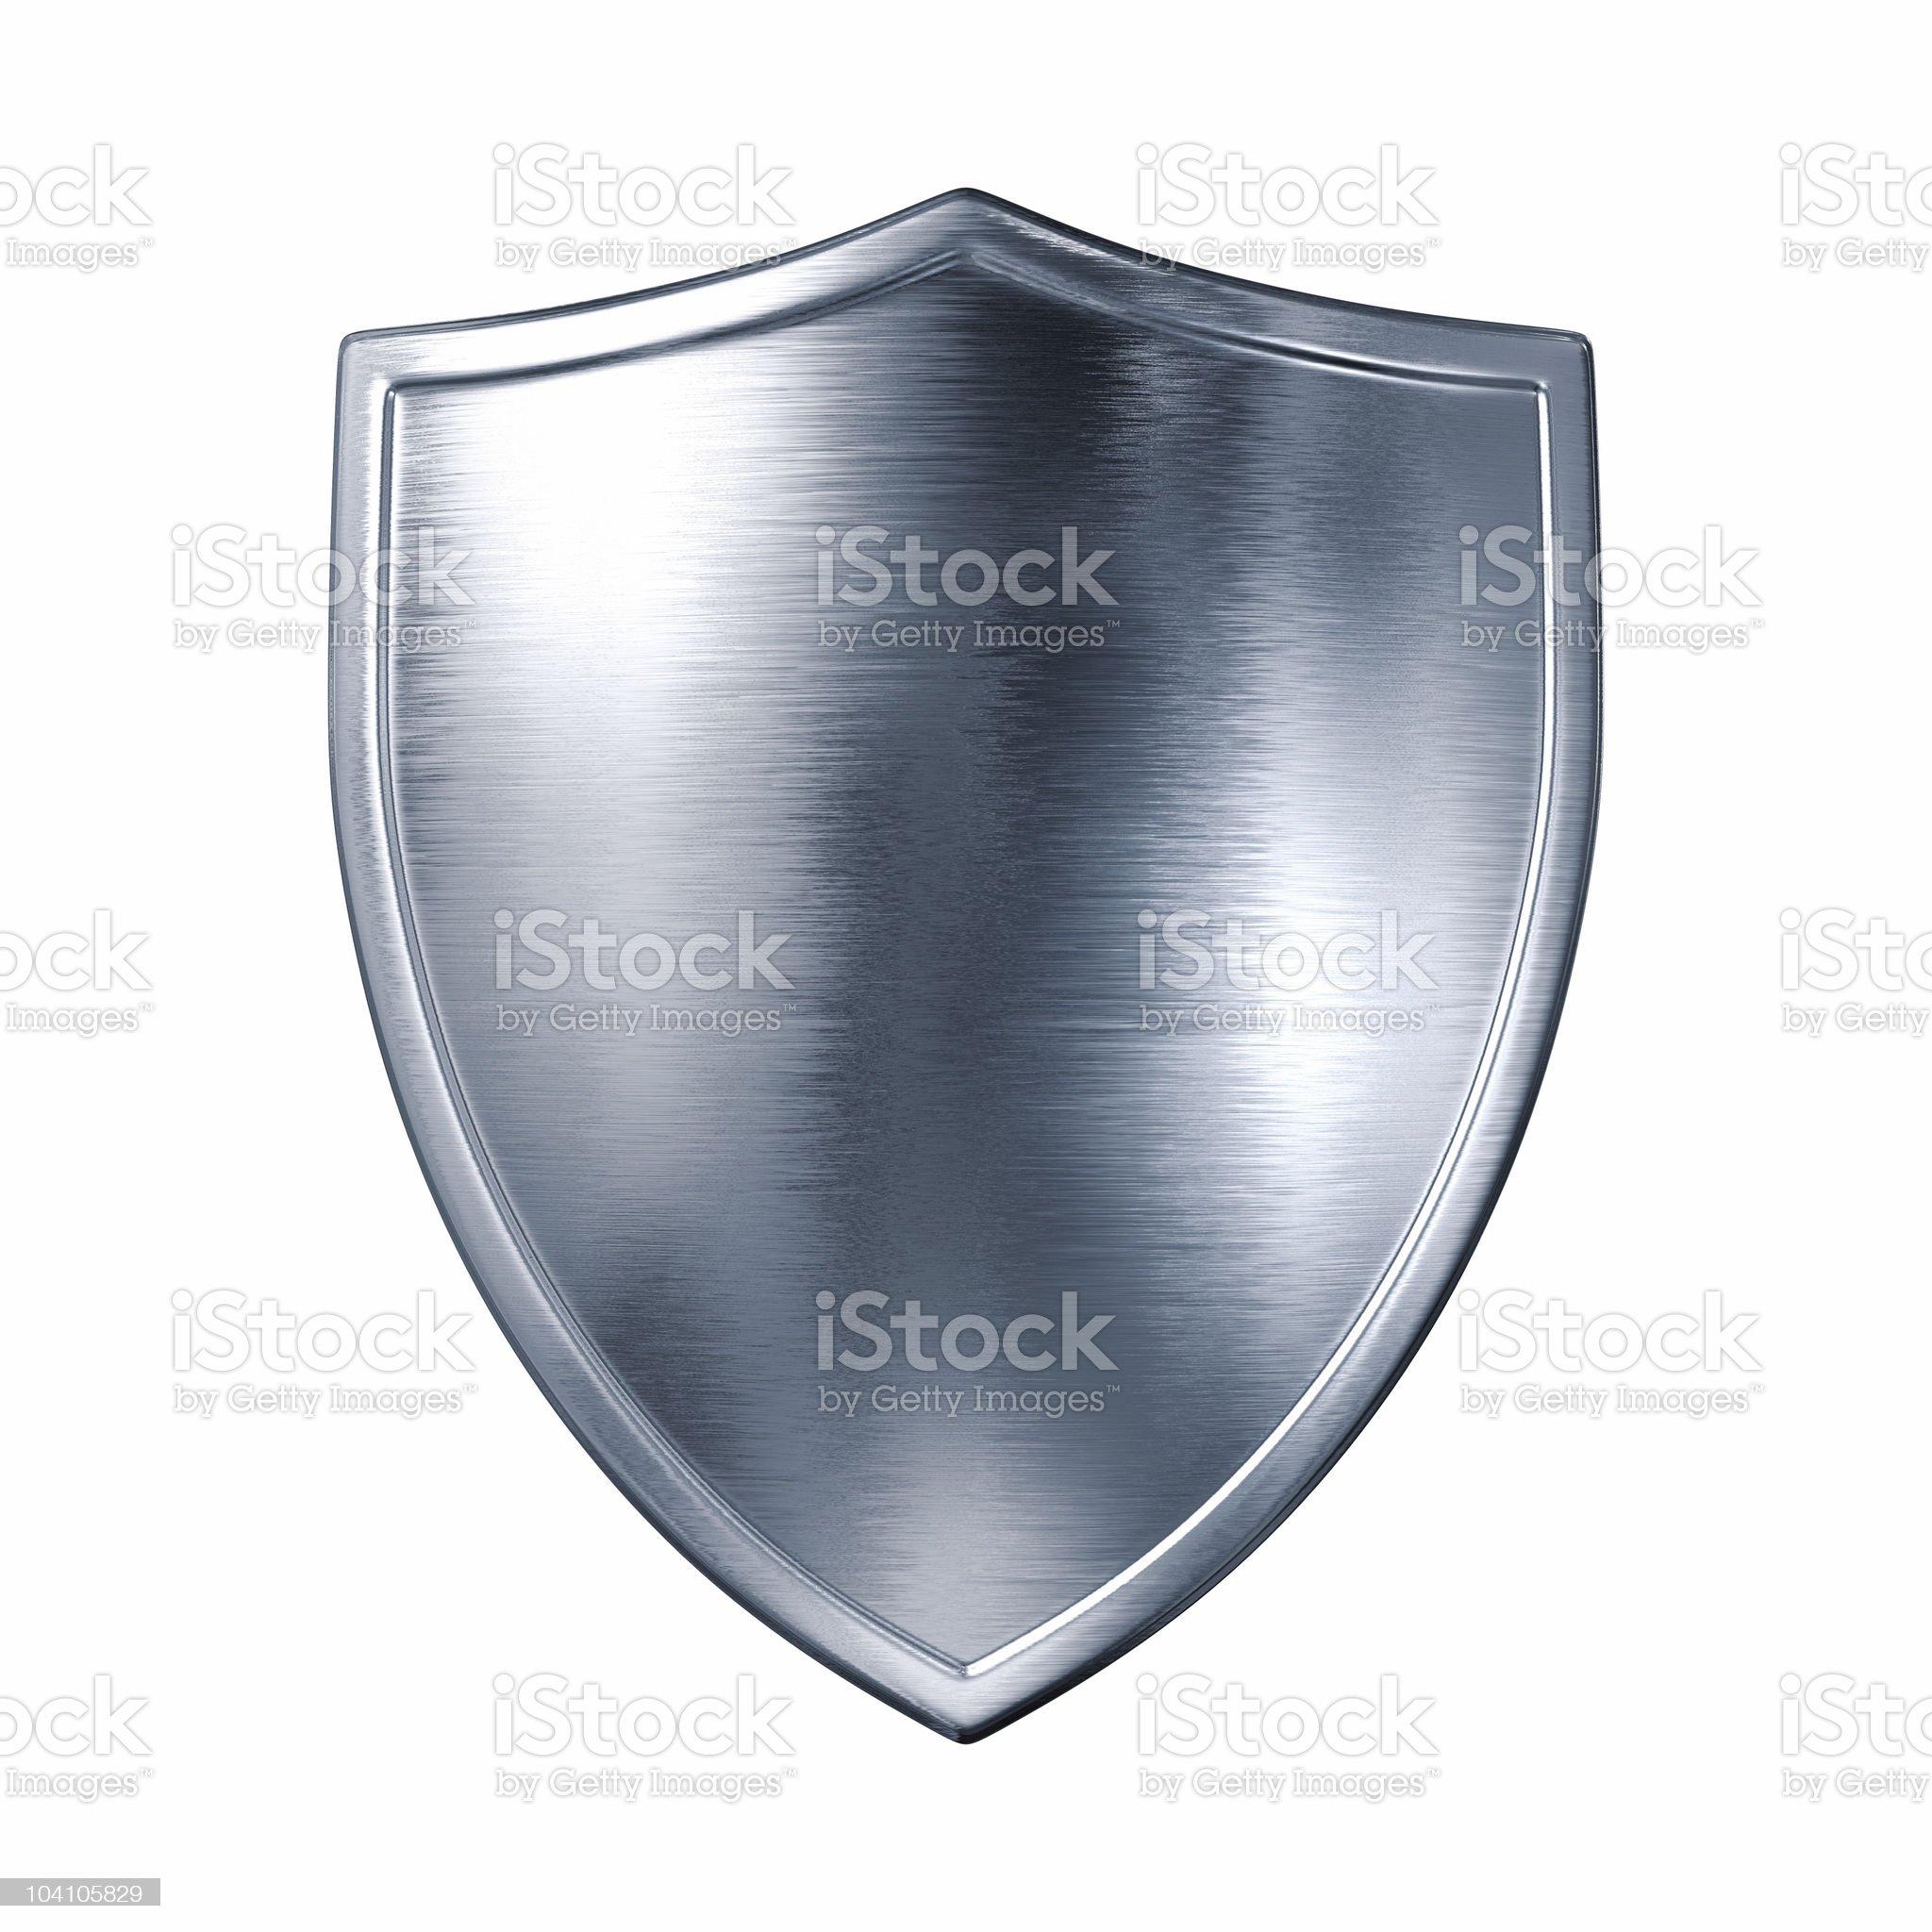 Silver shield royalty-free stock photo